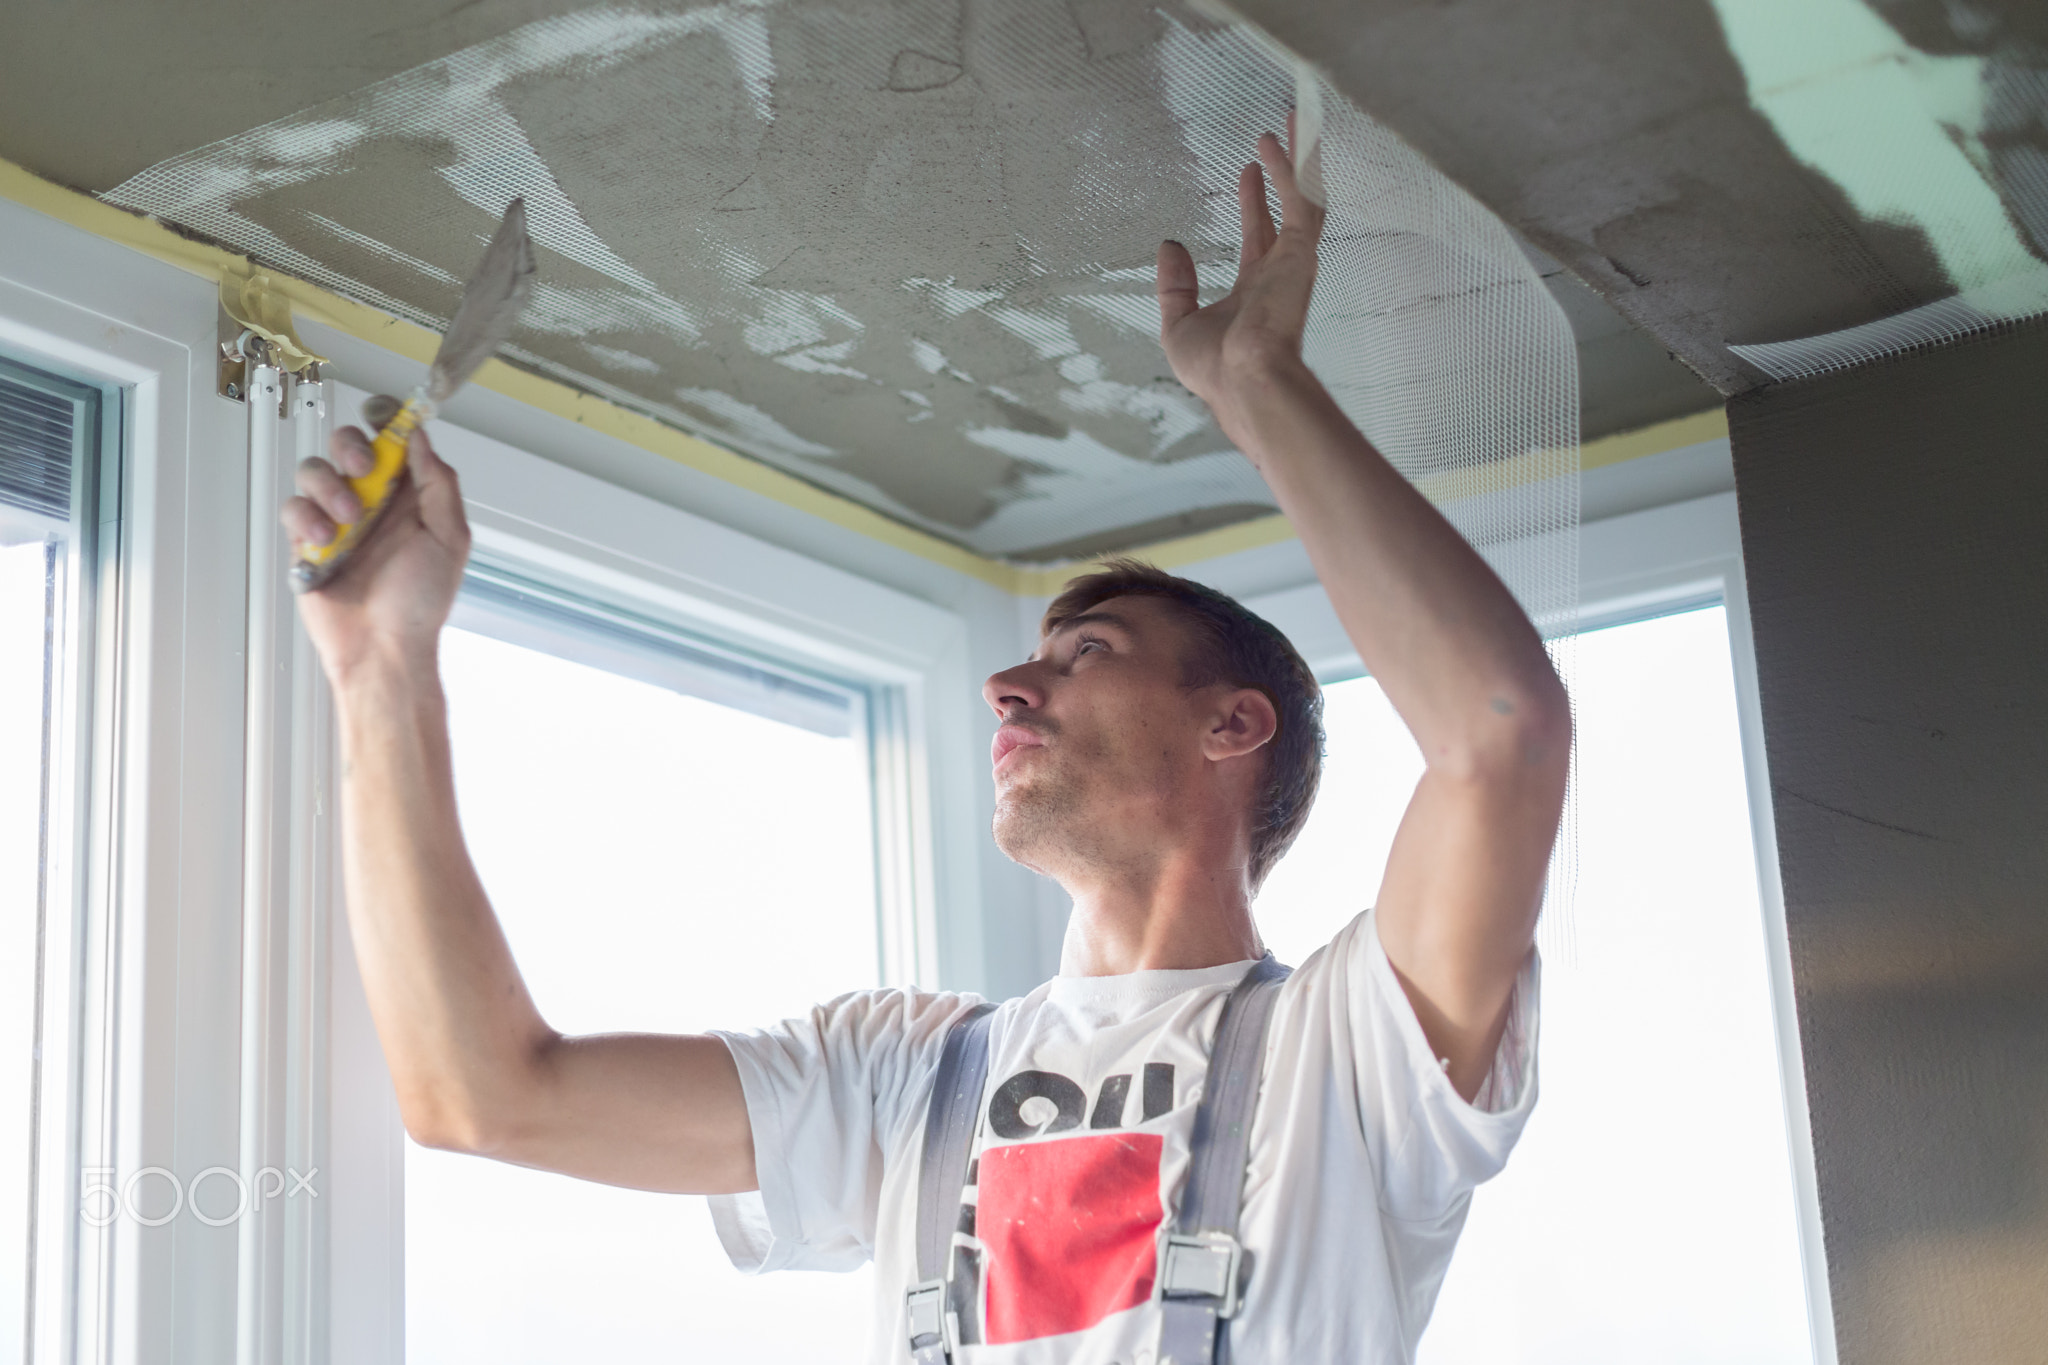 Plasterer renovating indoor walls and ceilings. Finishing works.